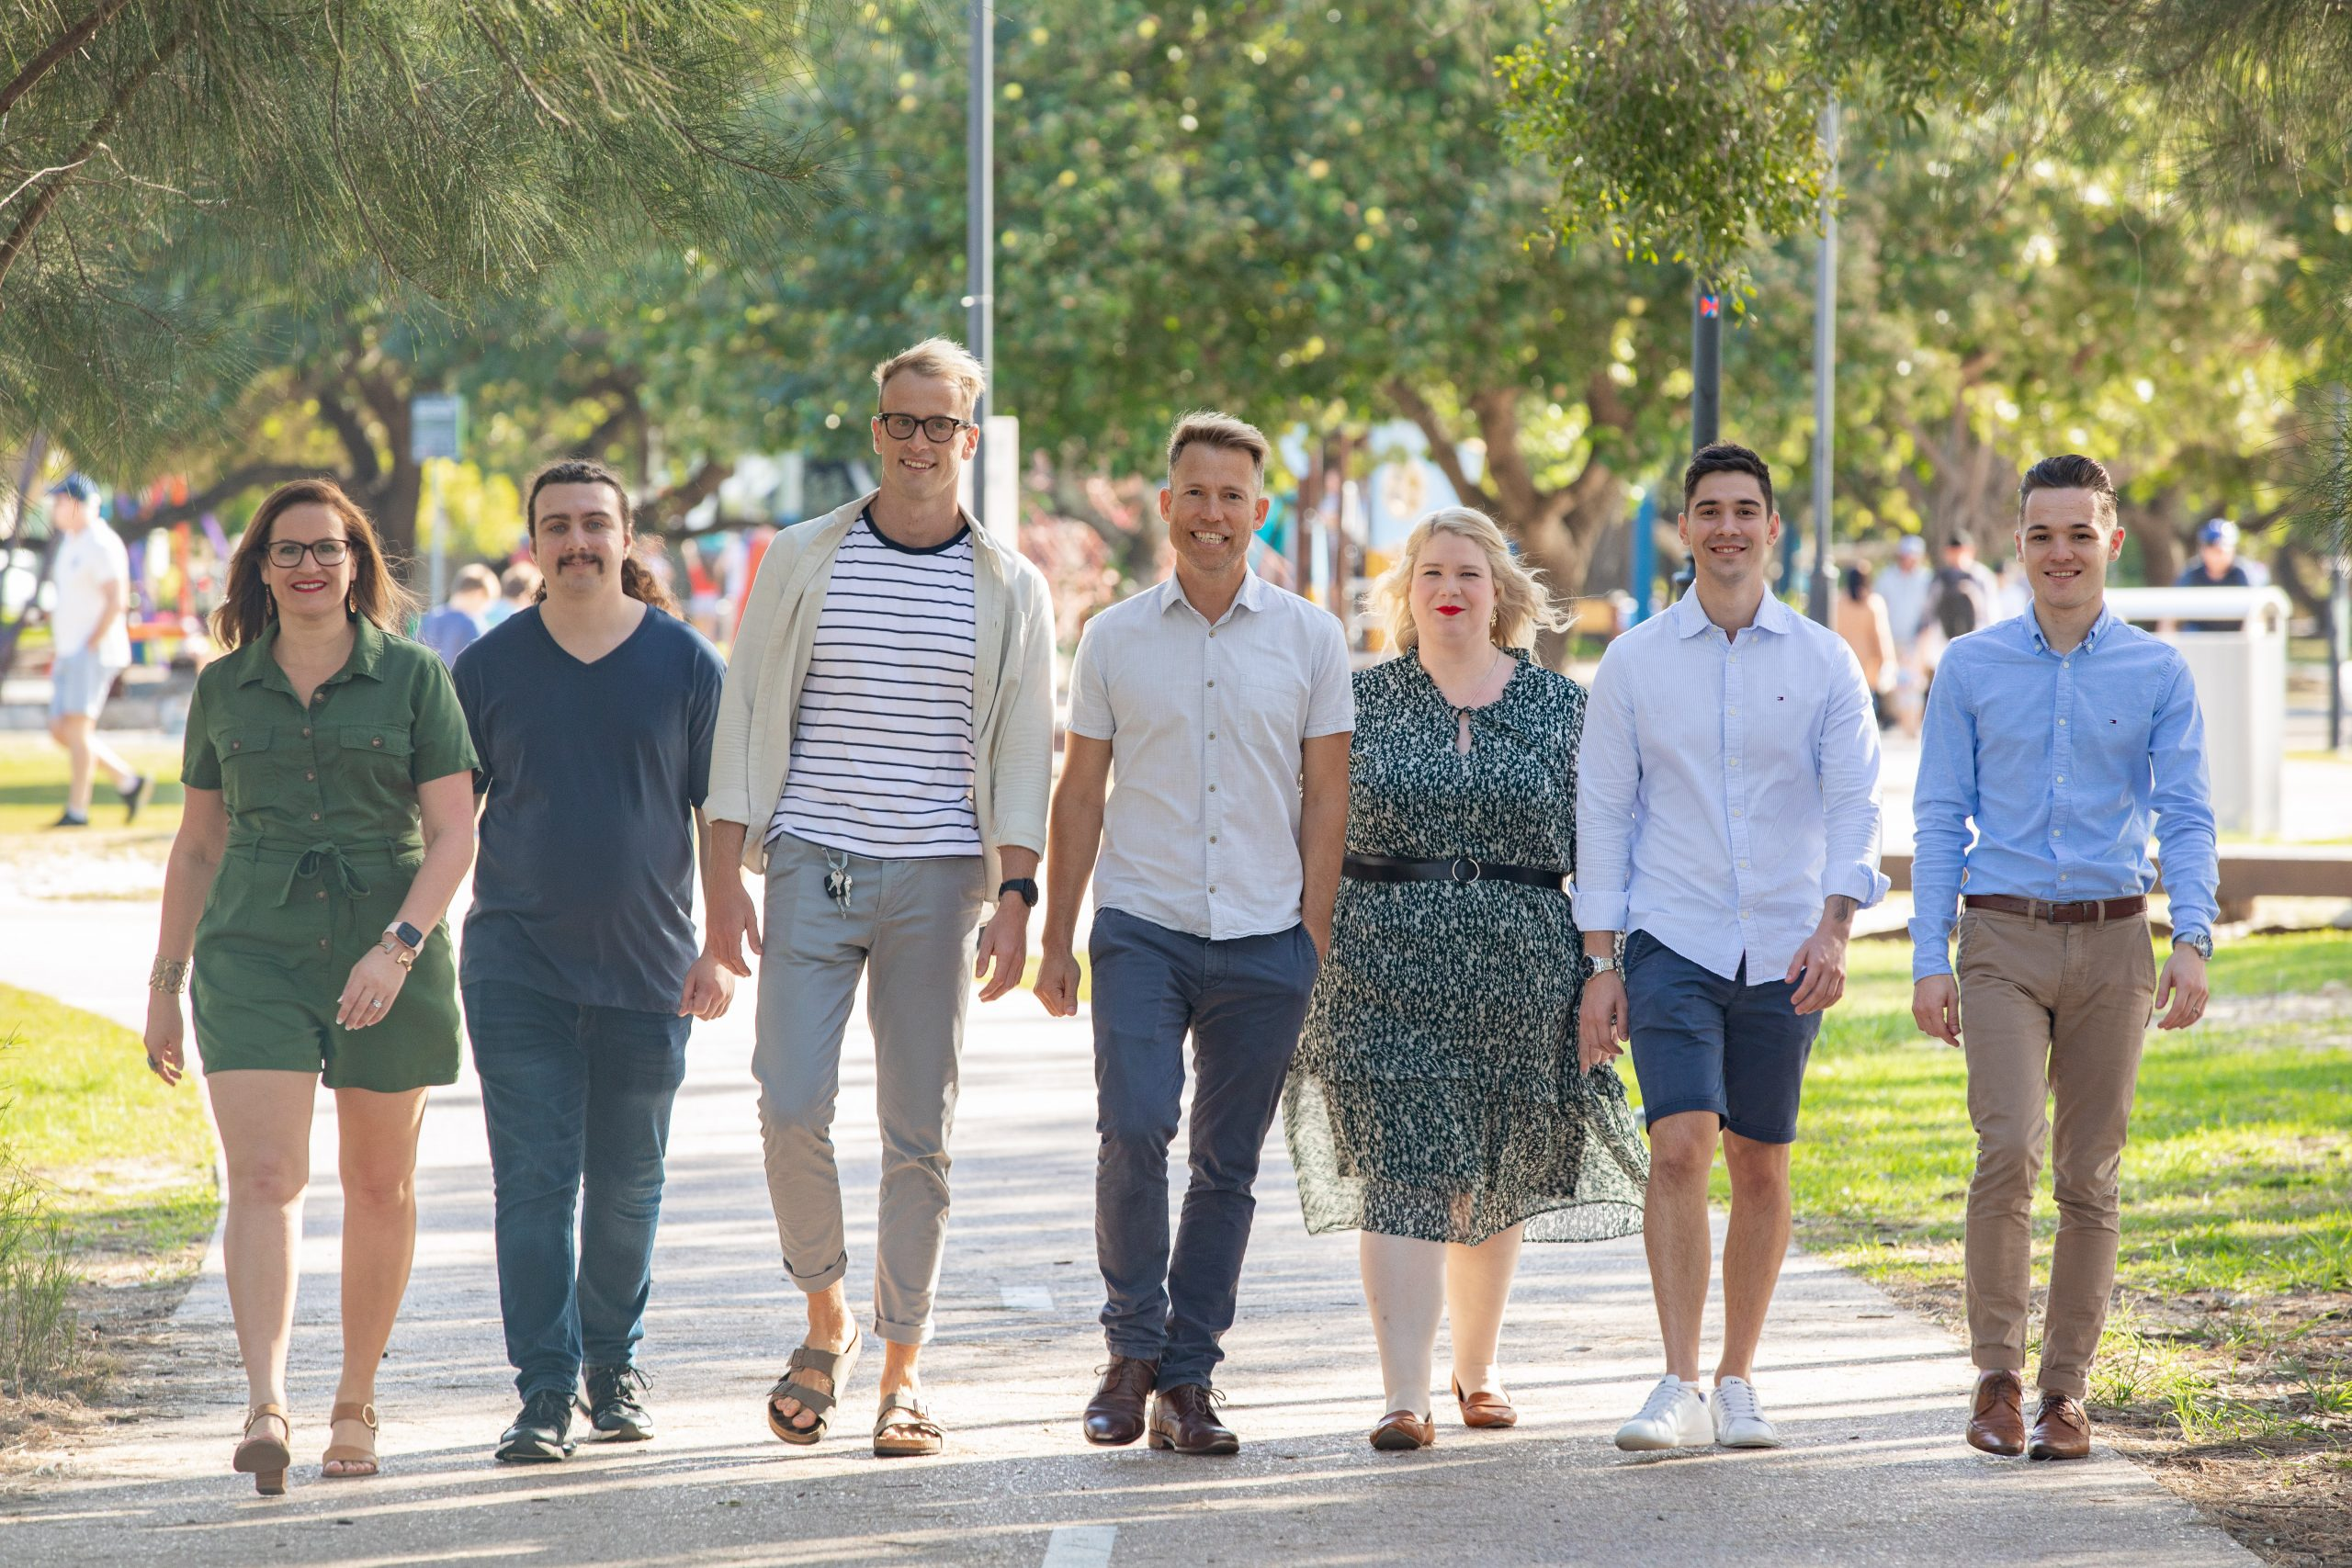 Bing Ads - the DNHQ team walking alongside each other